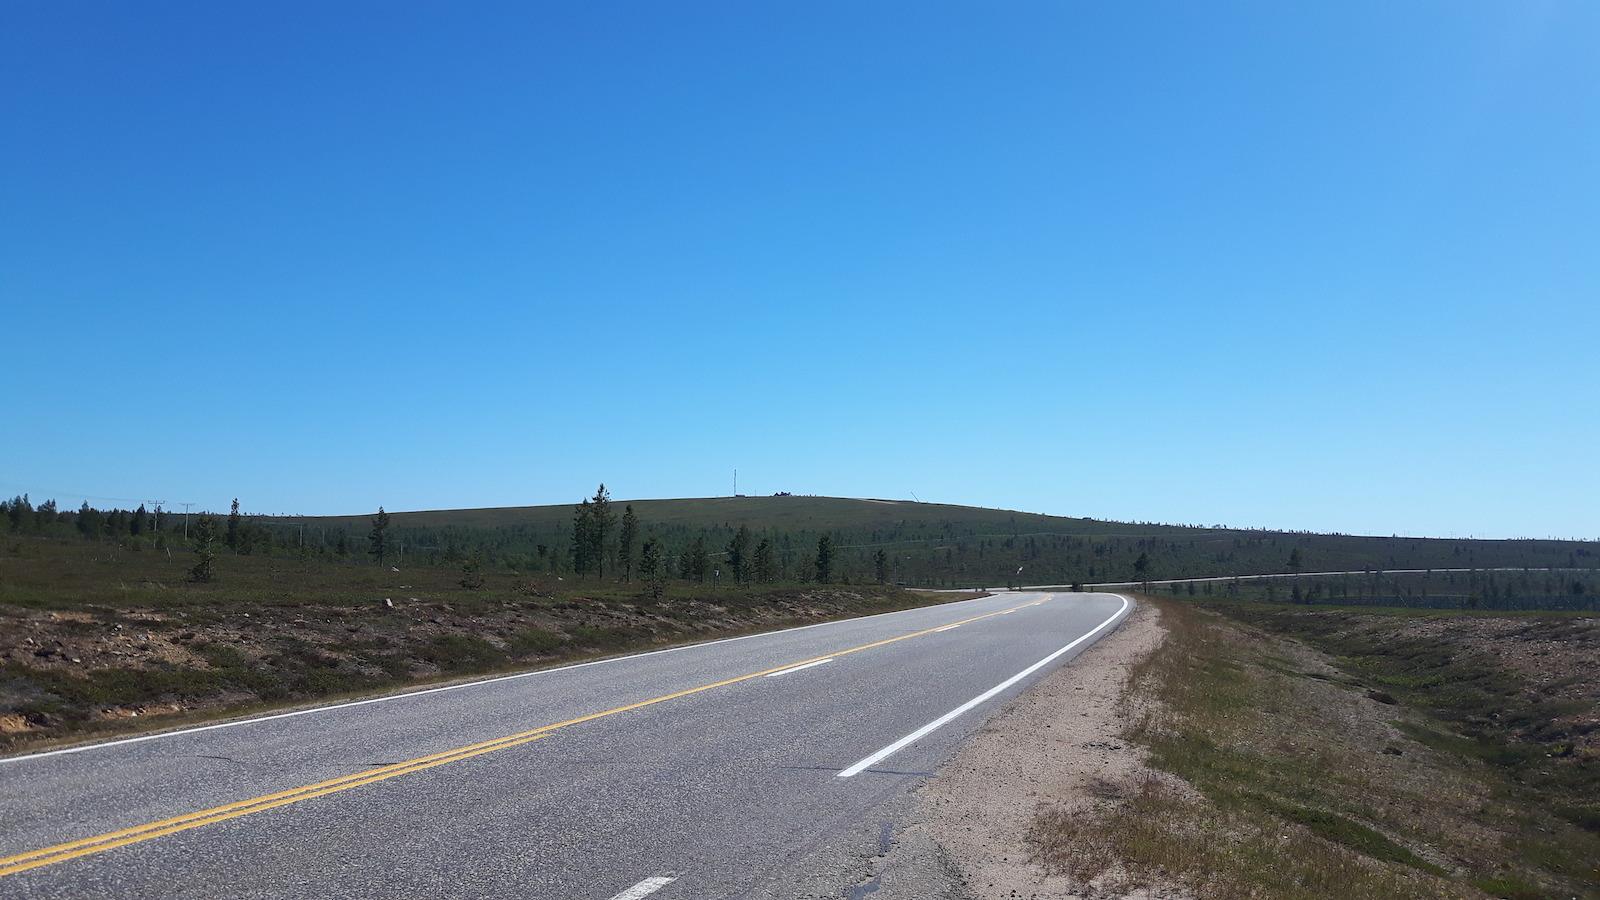 Road near Saariselkä Finland